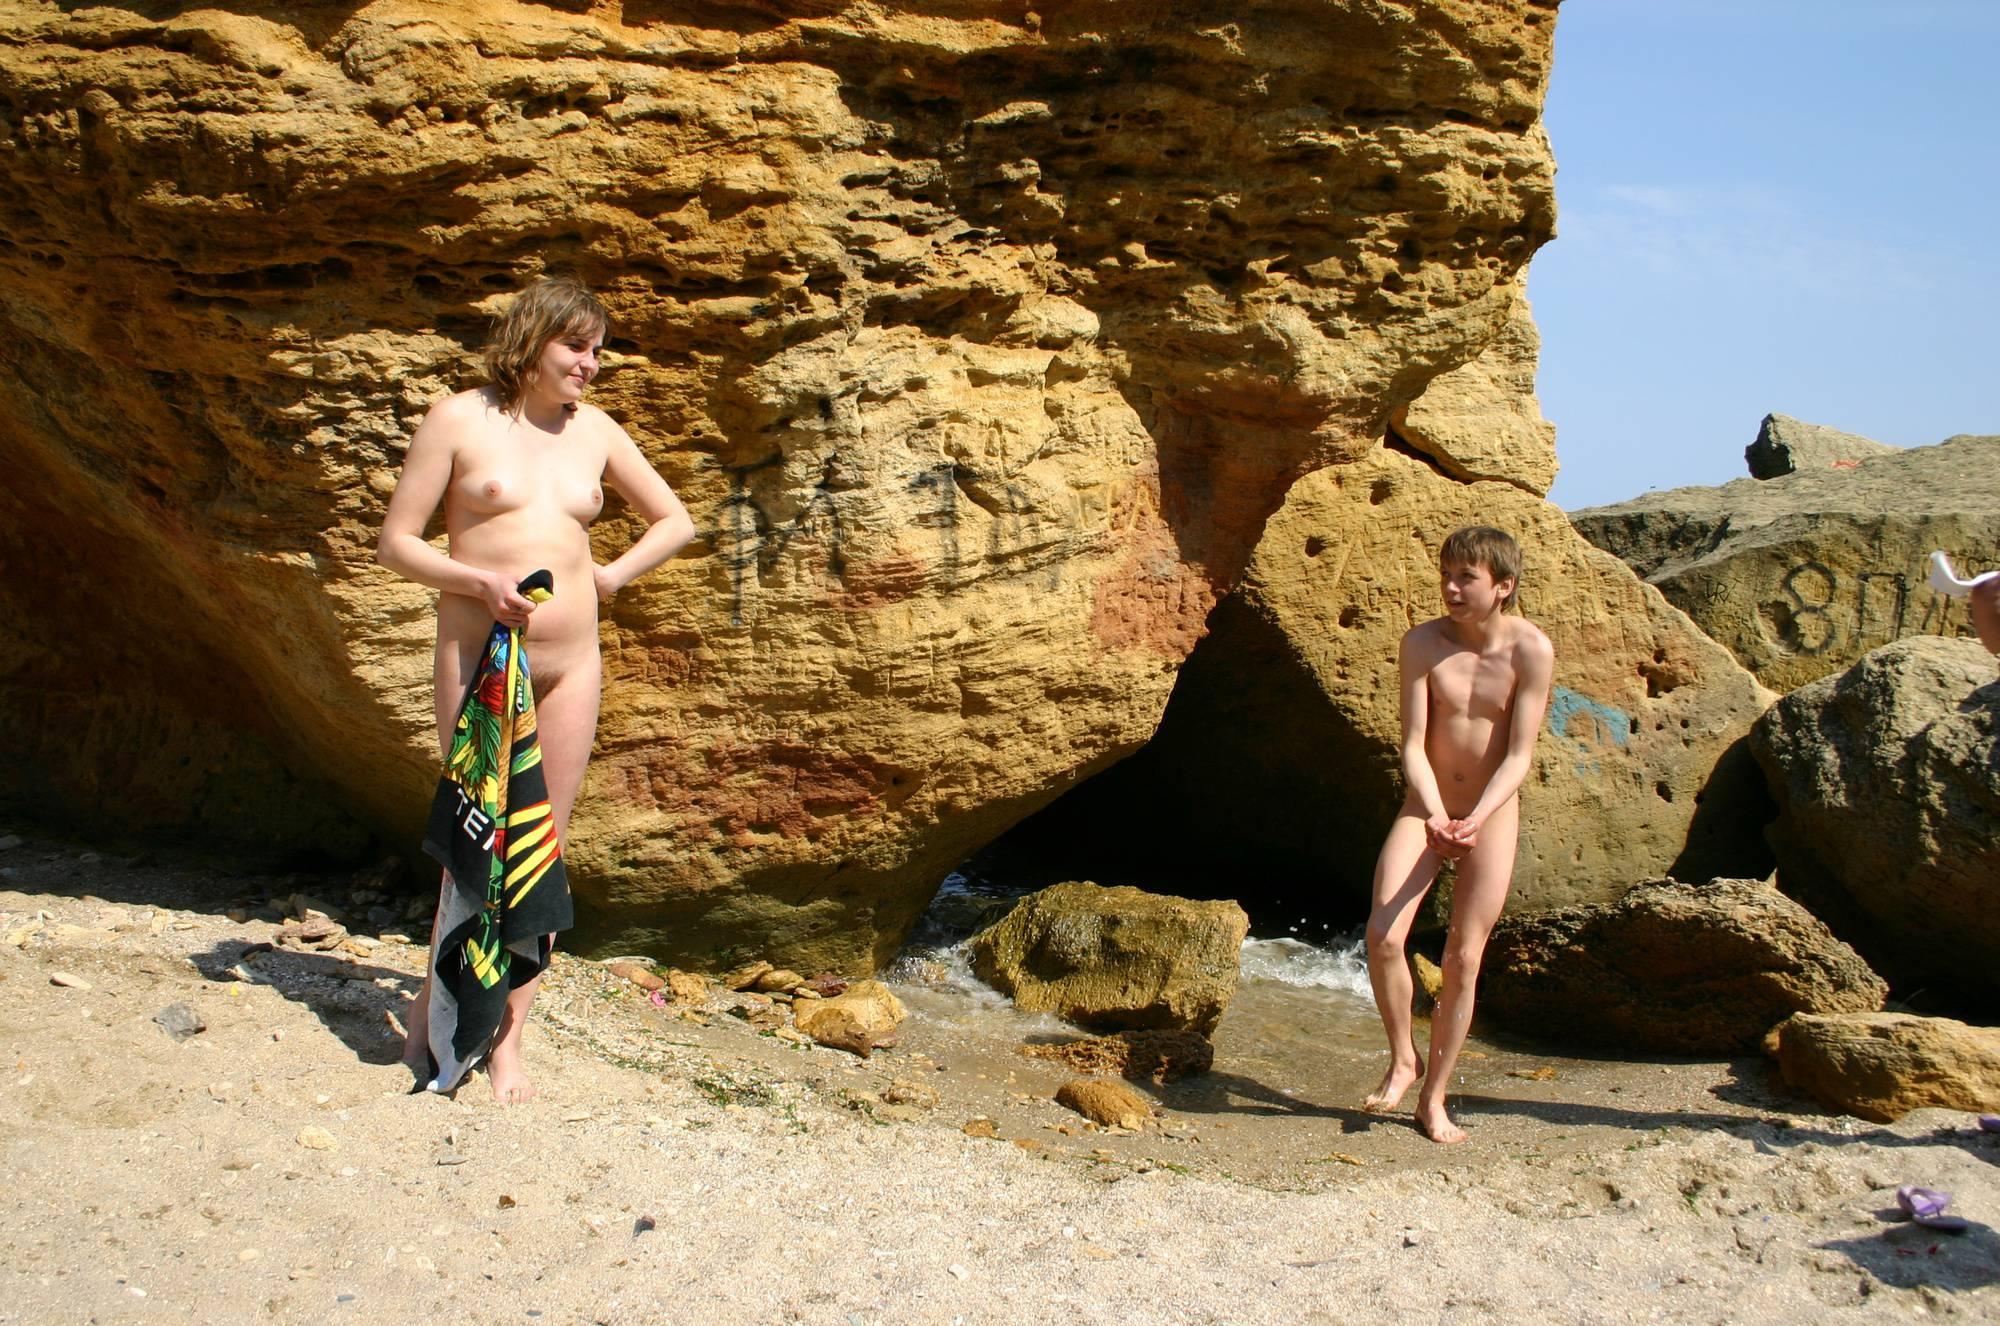 Pure Nudism-Playing Around the Rocks - 3